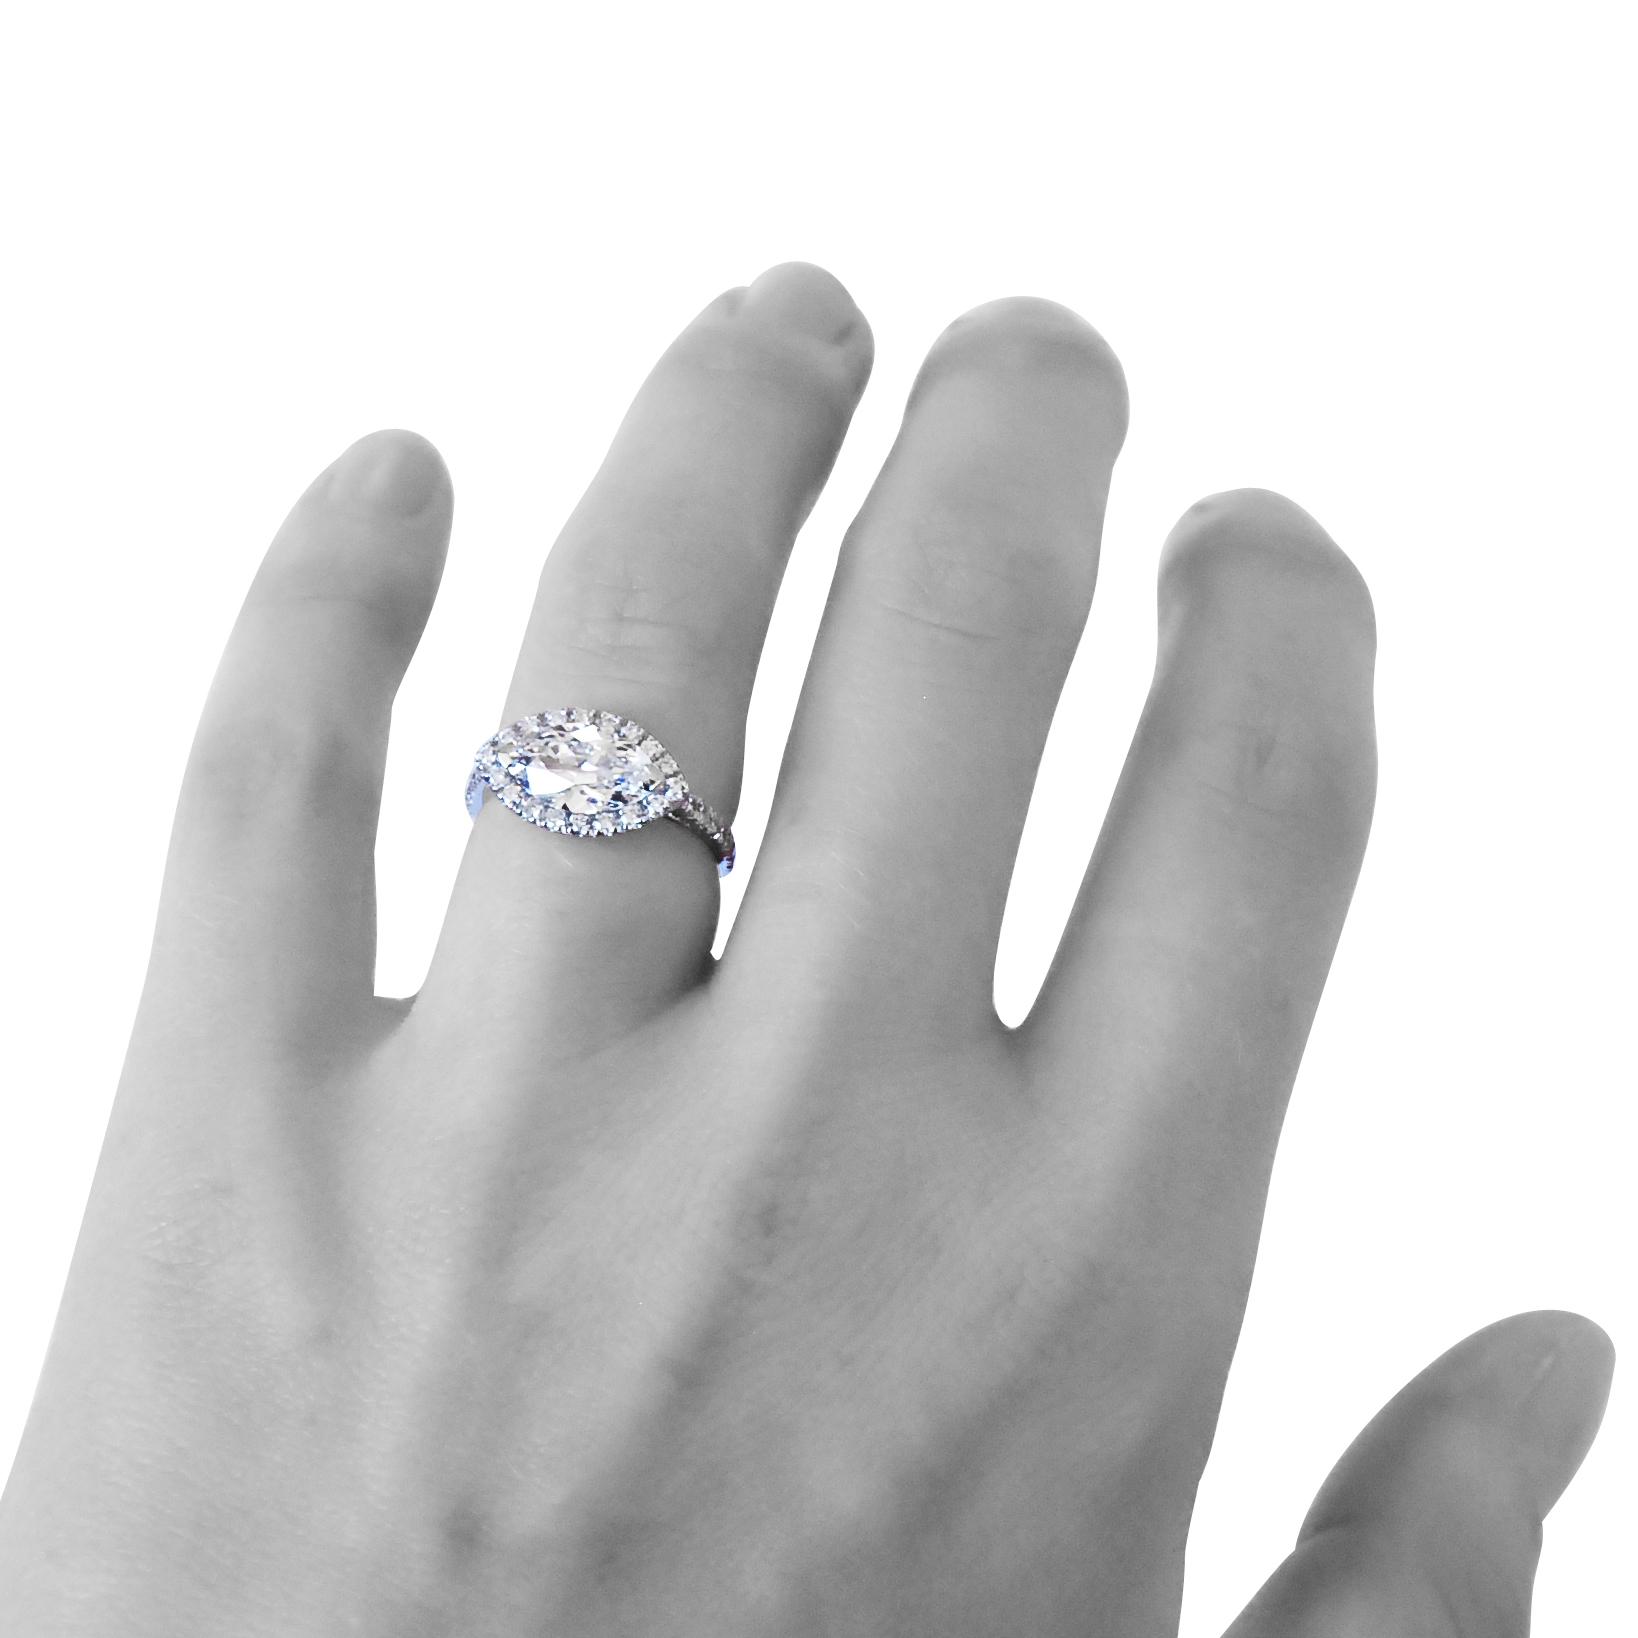 marquise-cut-diamond-engagement-ring-1.jpg